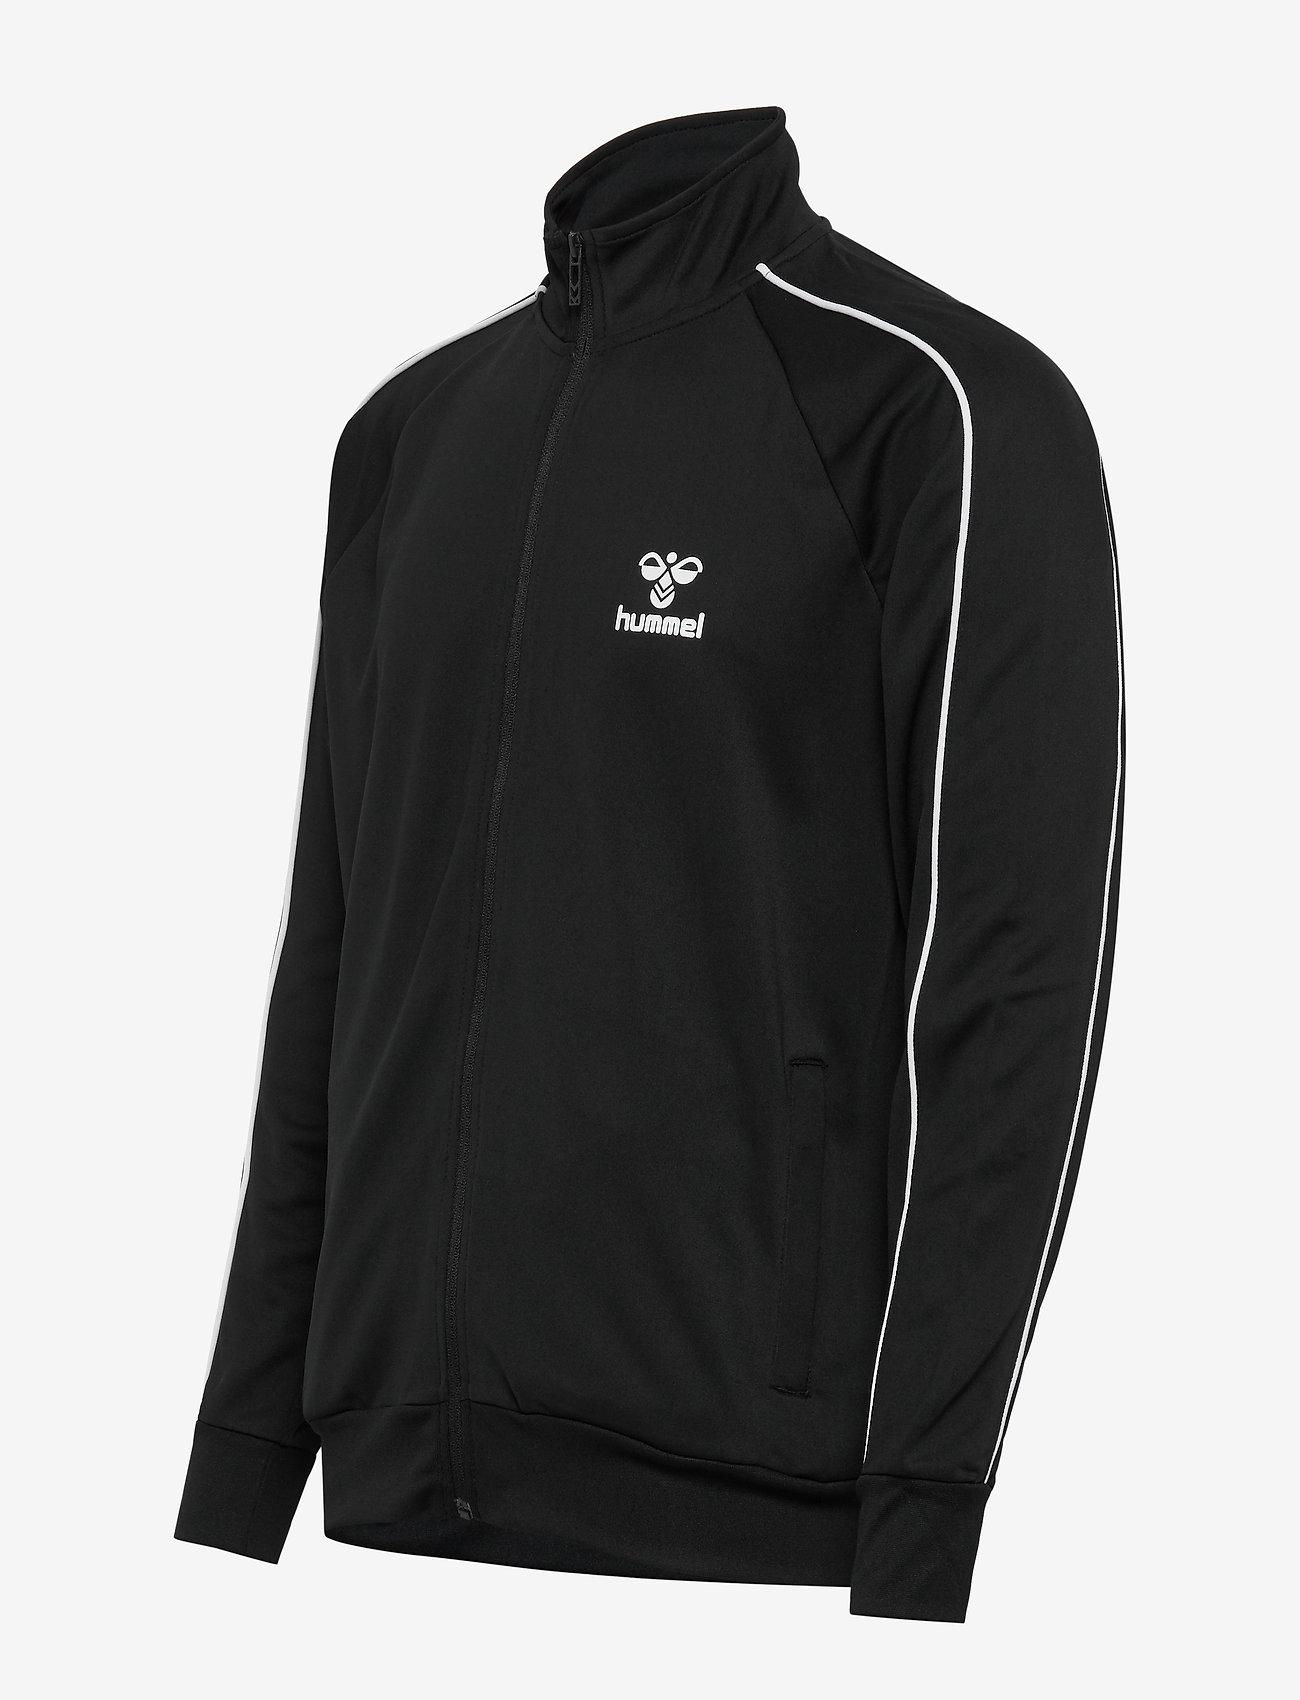 Hummel hmlARNE ZIP JACKET - Sweatshirts BLACK - Menn Klær